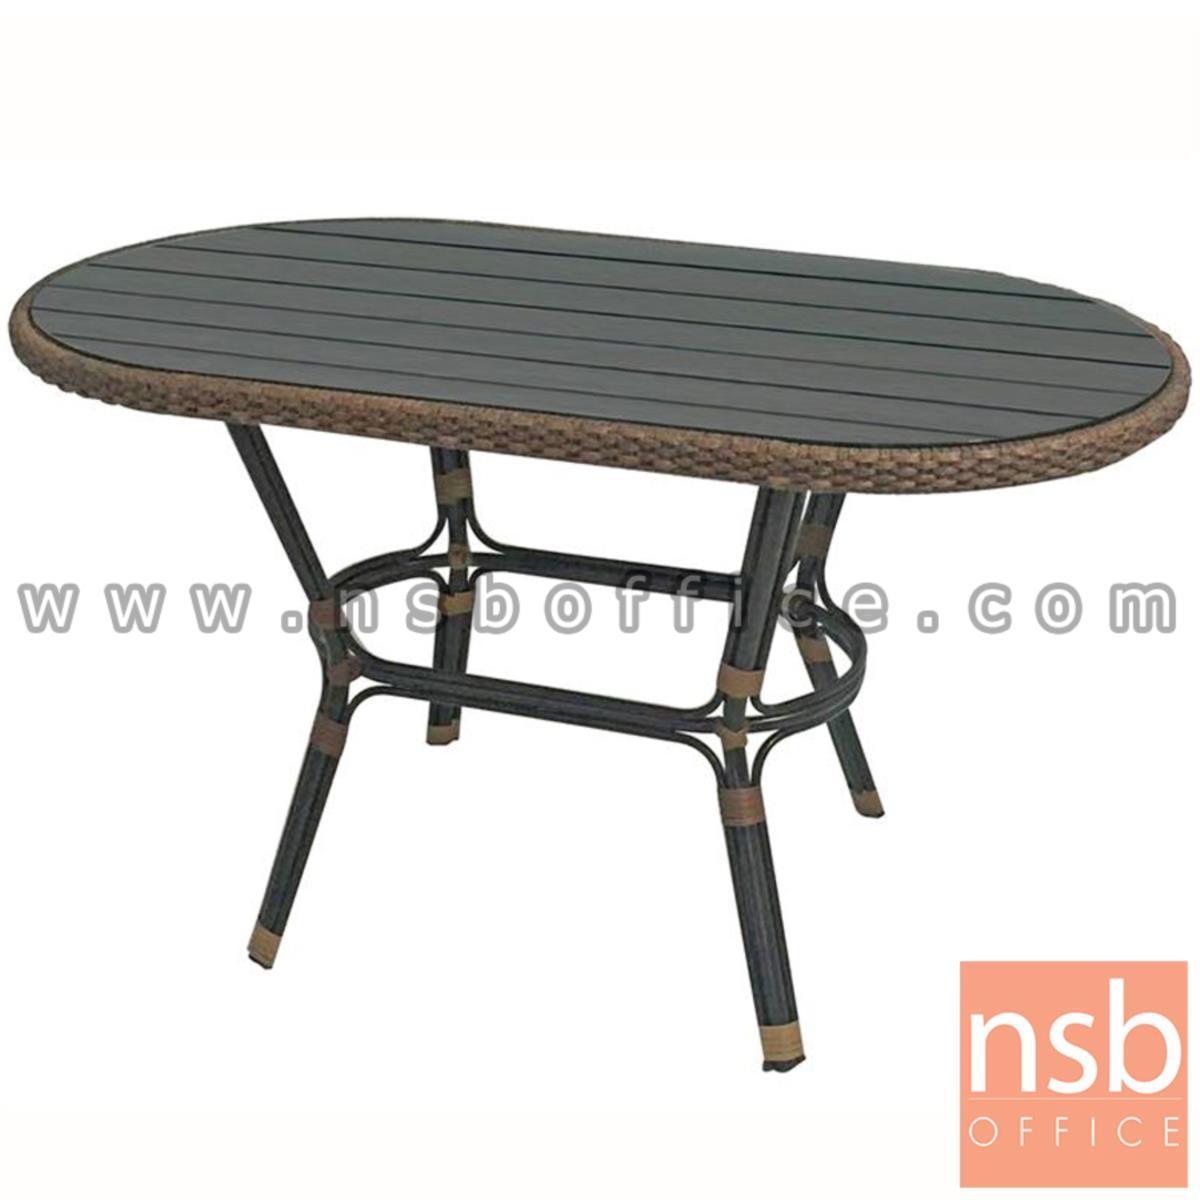 G08A237:โต๊ะหวายสานหน้าวงรี 130W*75D cm. หน้าไม้โพลีวูด รุ่น B-279 สีน้ำตาล